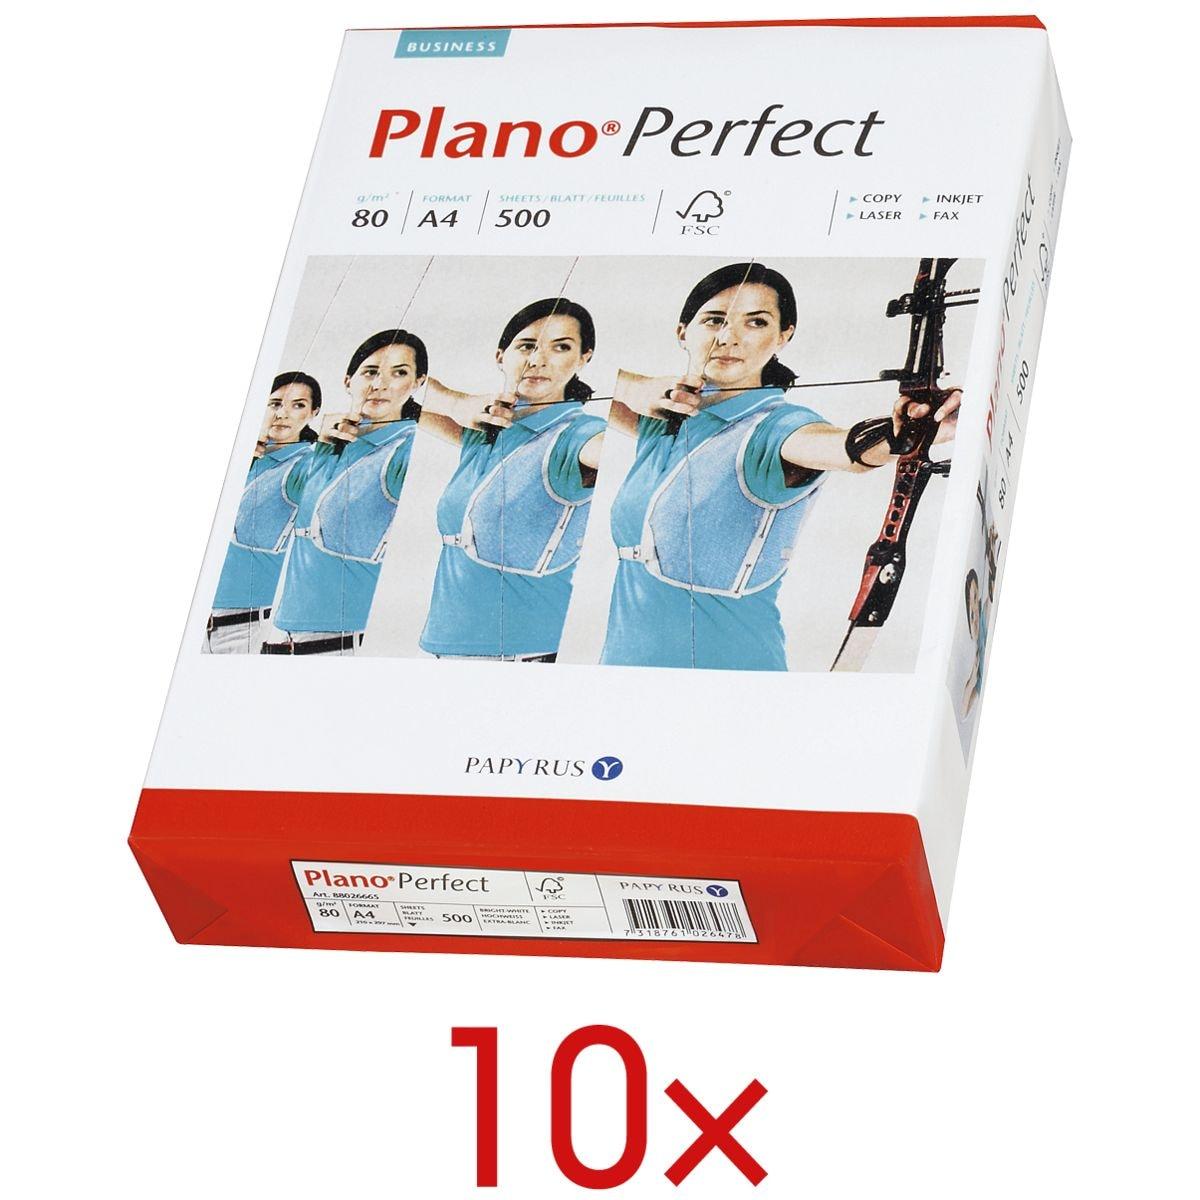 10x Multifunktionales Druckerpapier A4 Plano Perfect - 5000 Blatt gesamt